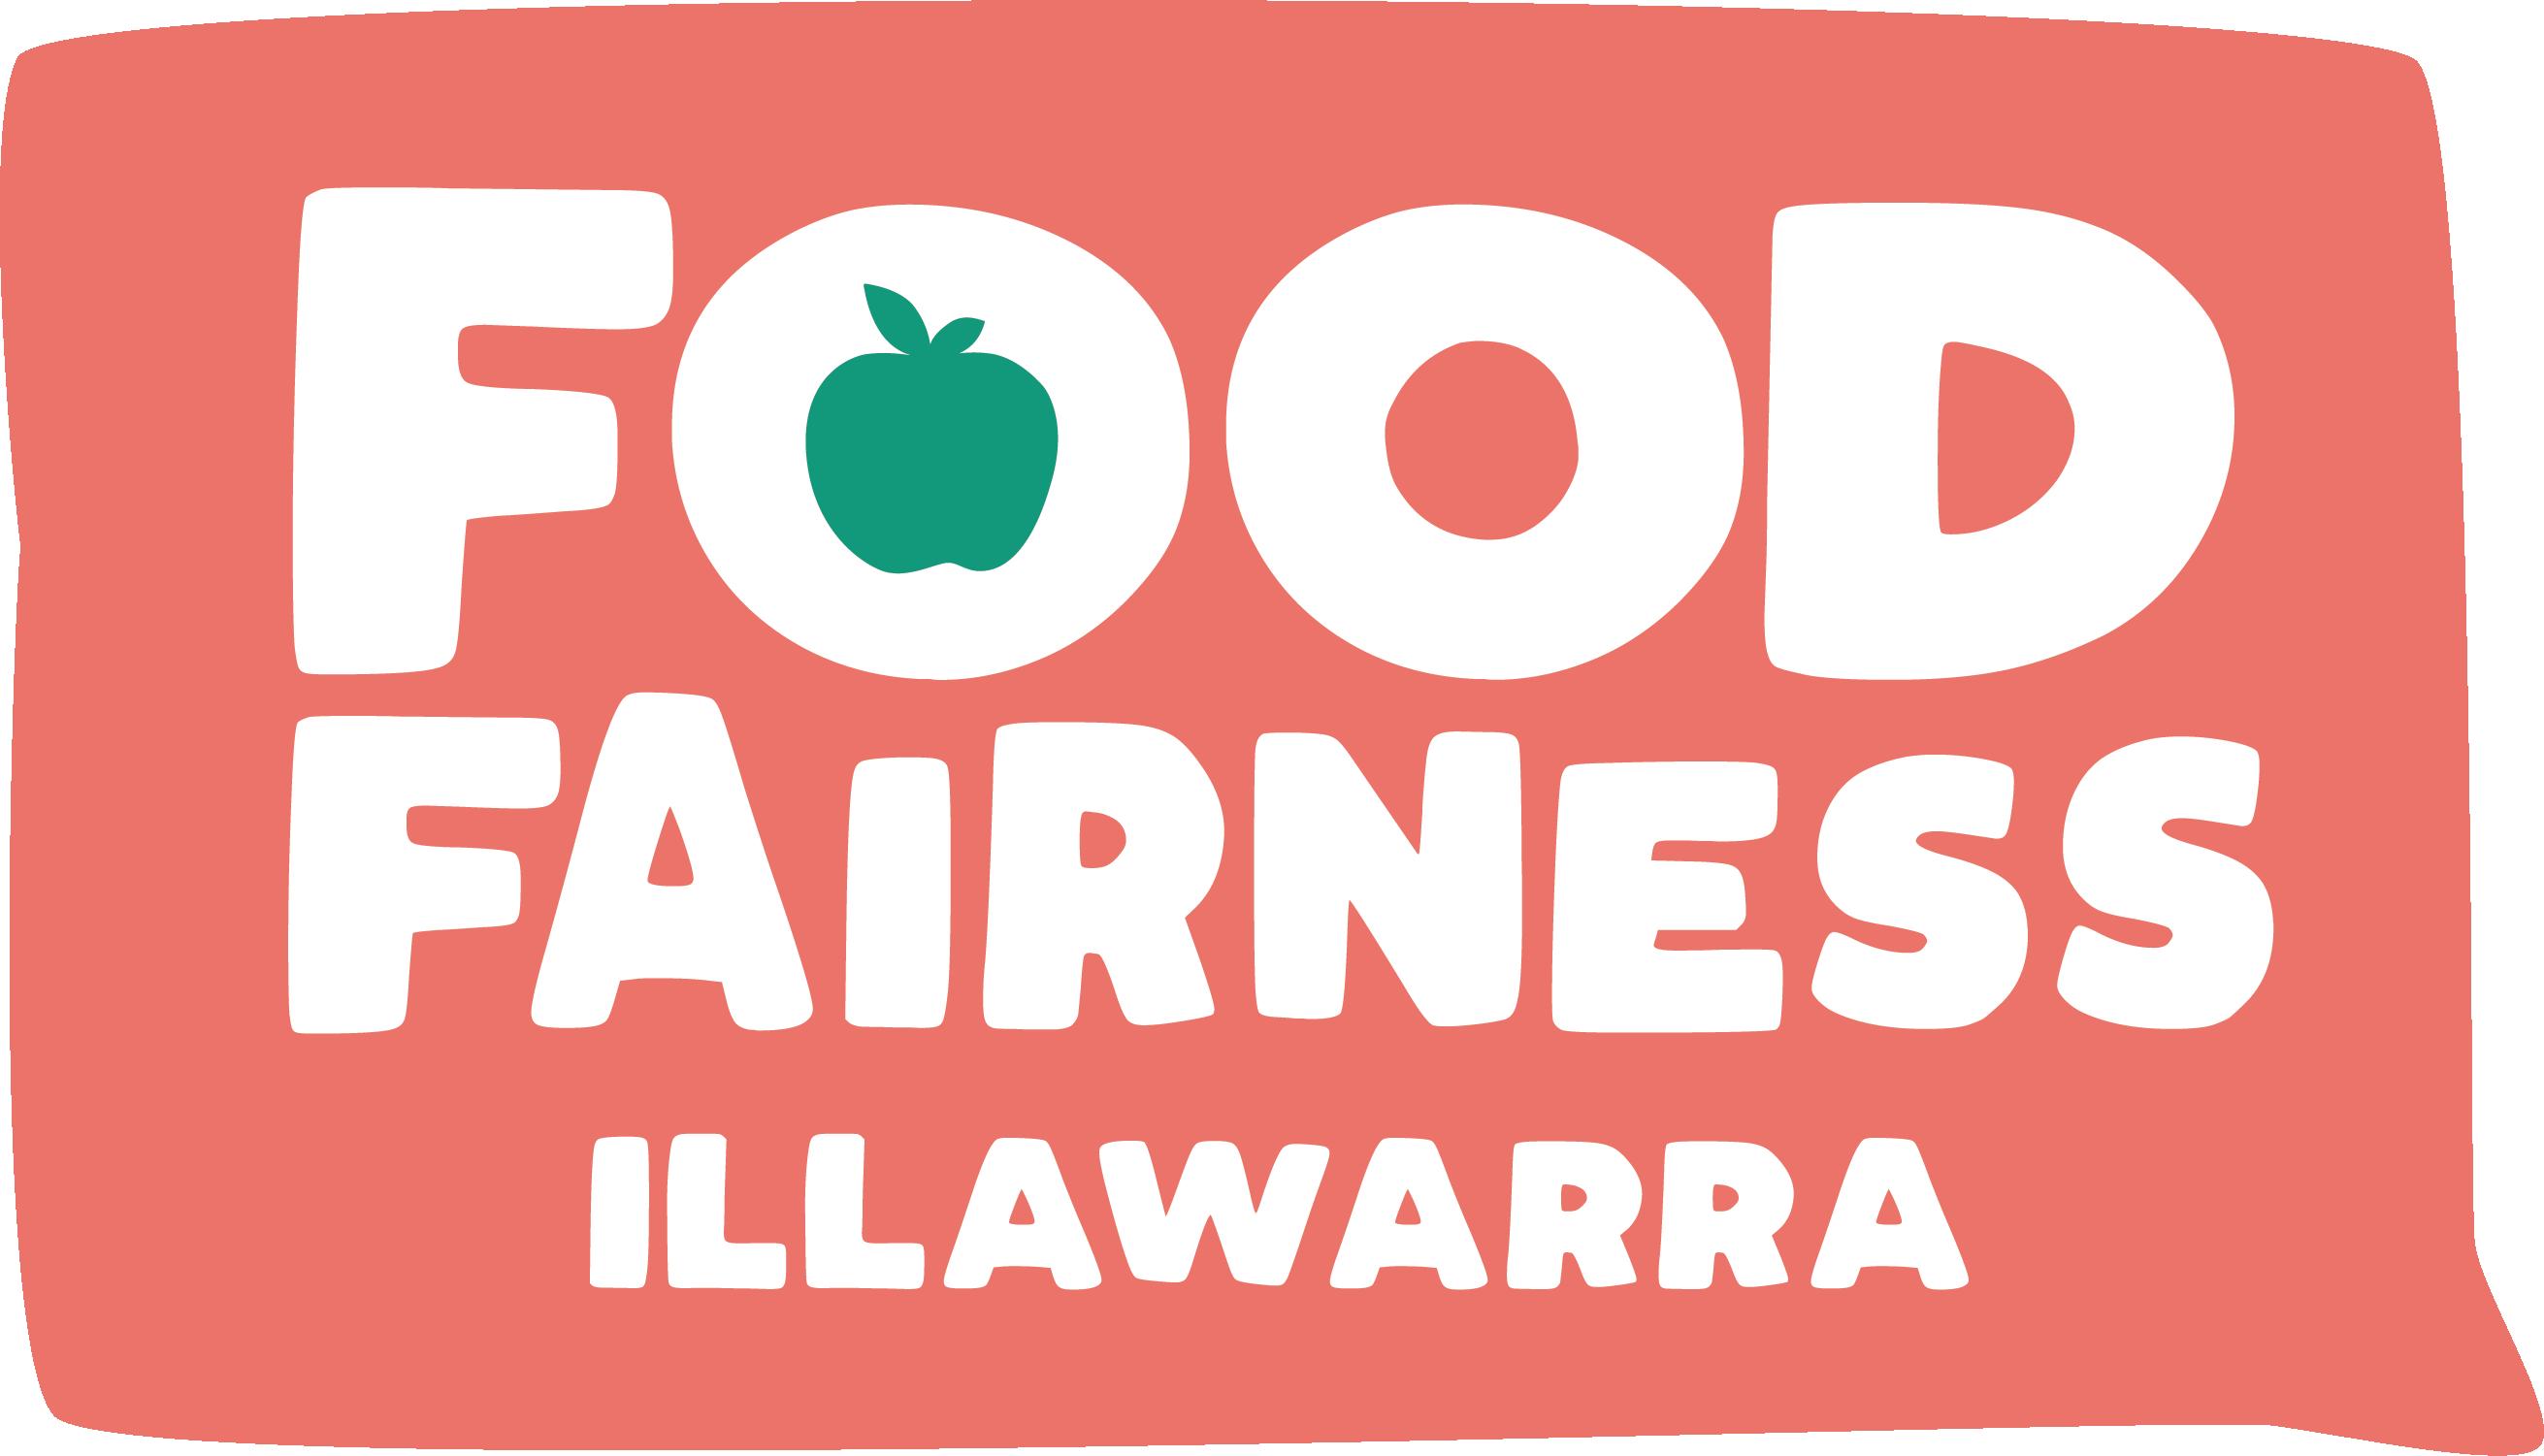 Food Fairness Illawarra Logo